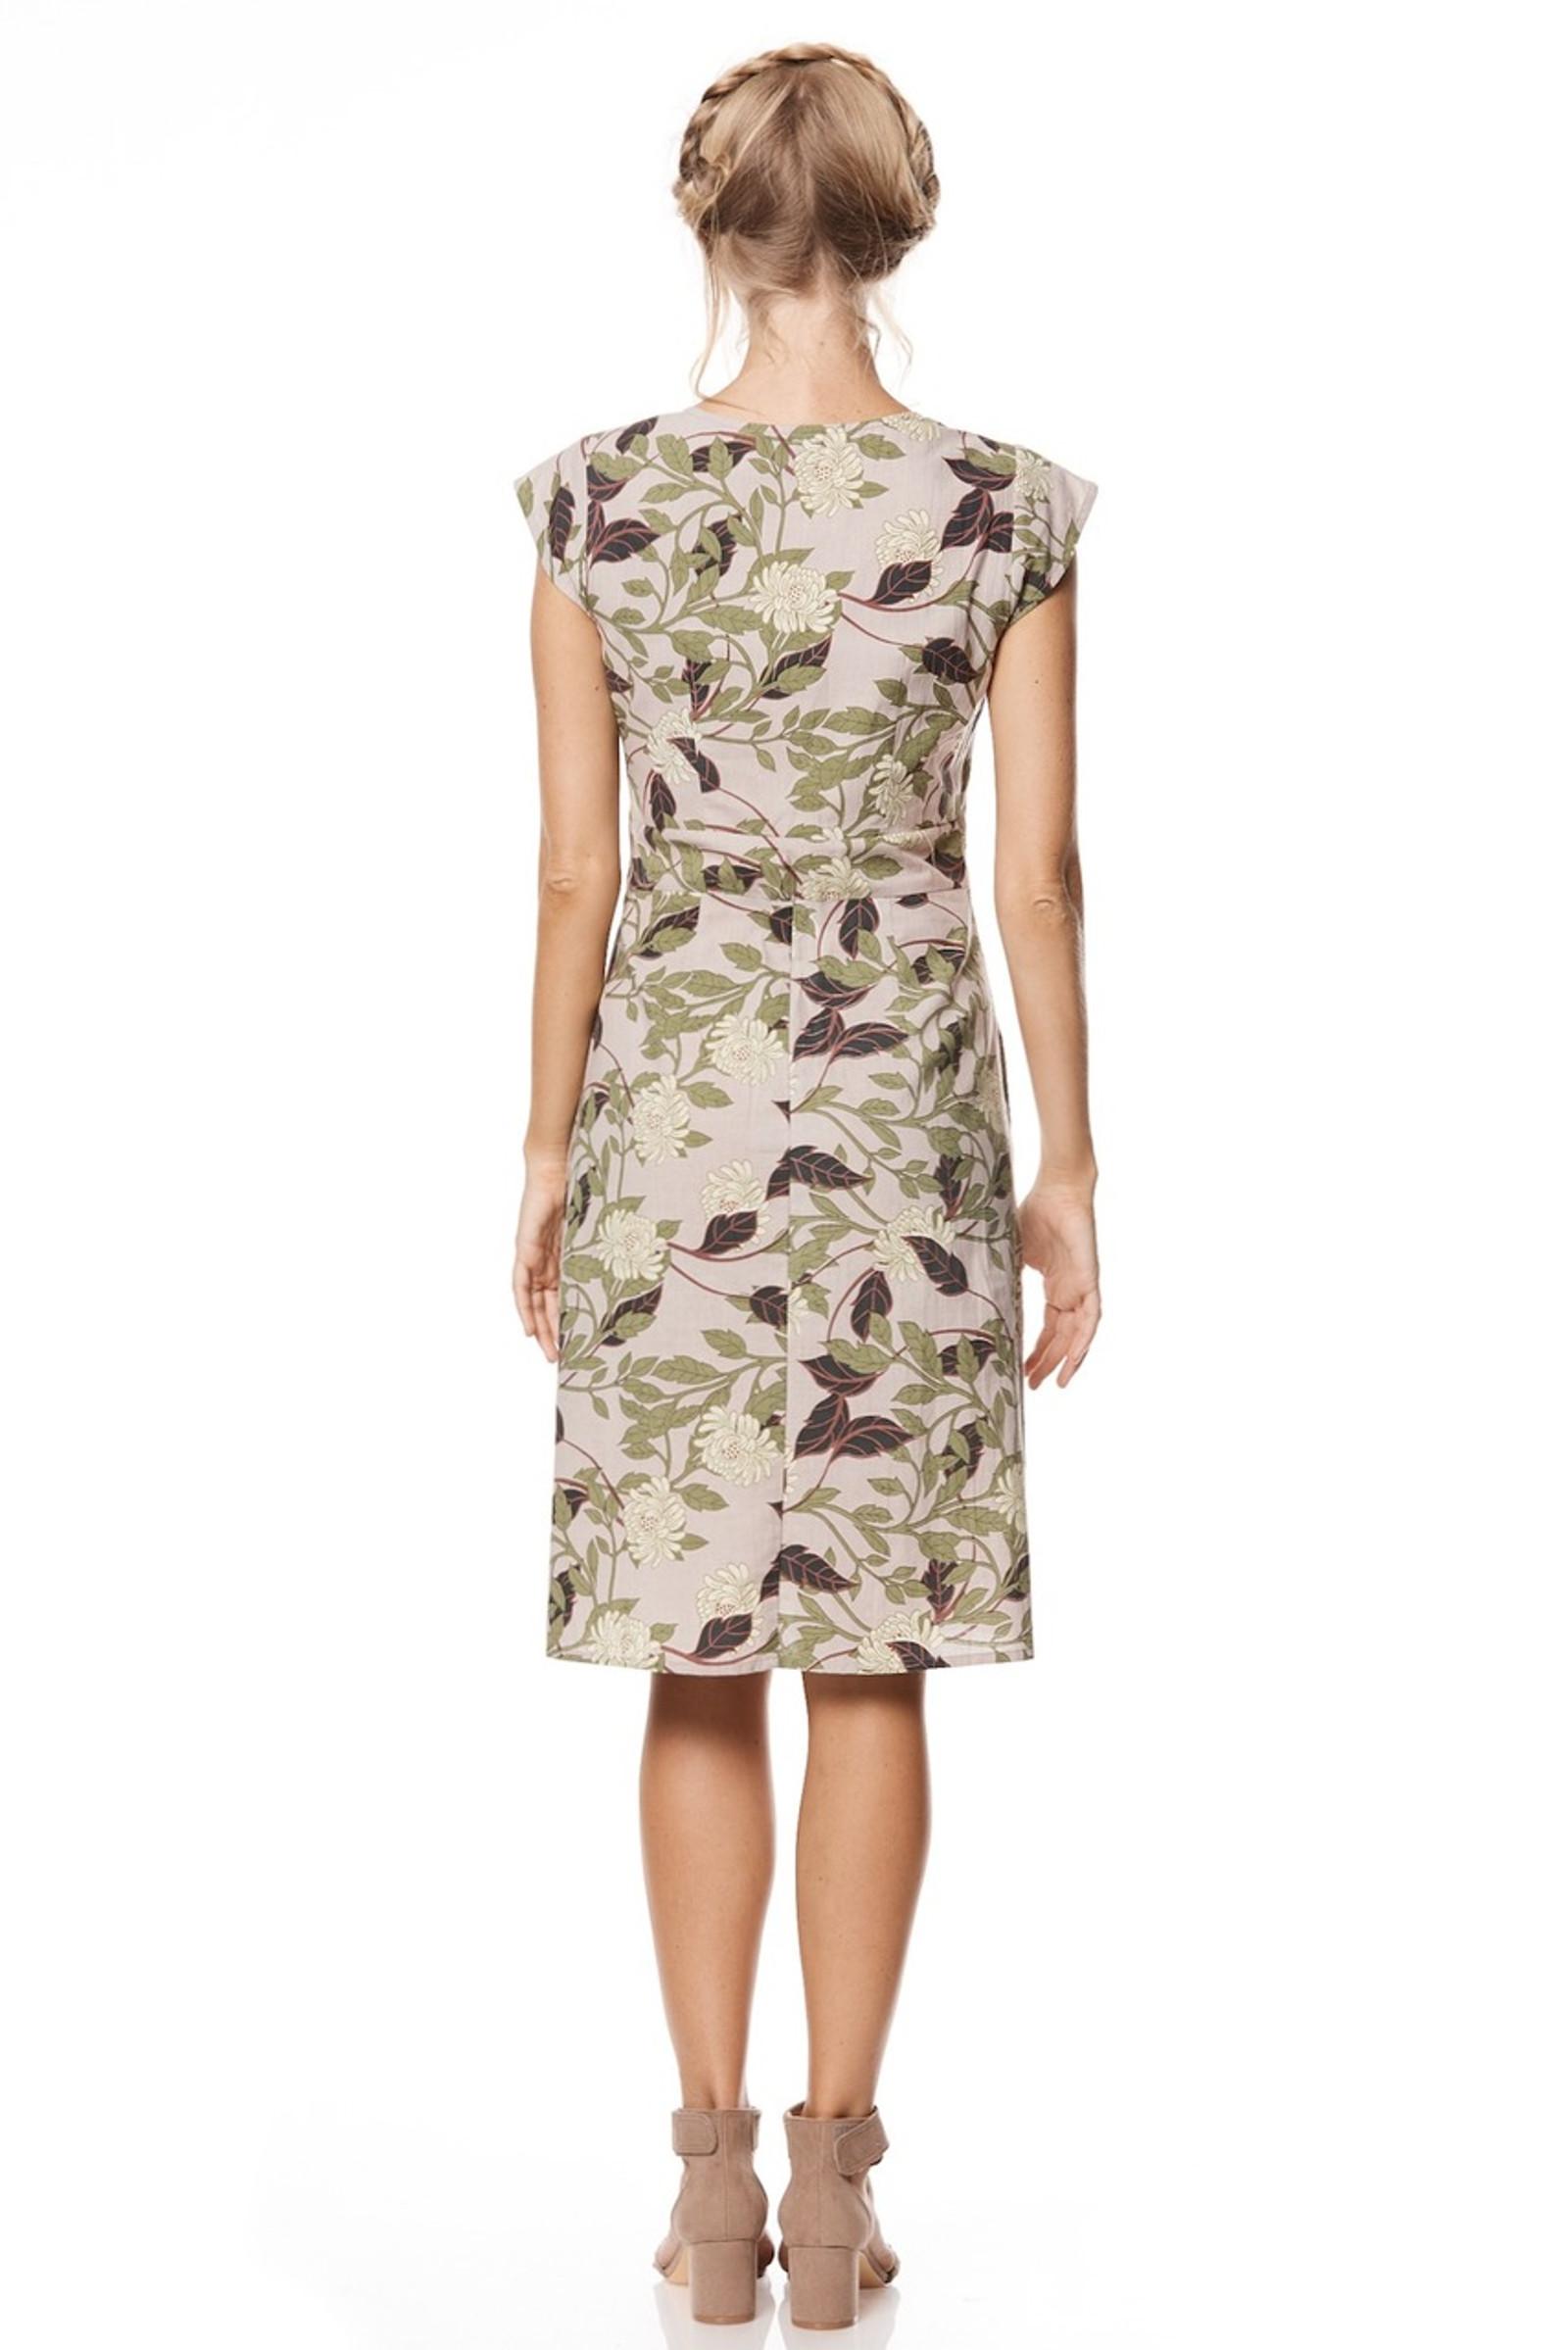 Elsy Dress - Magnolia